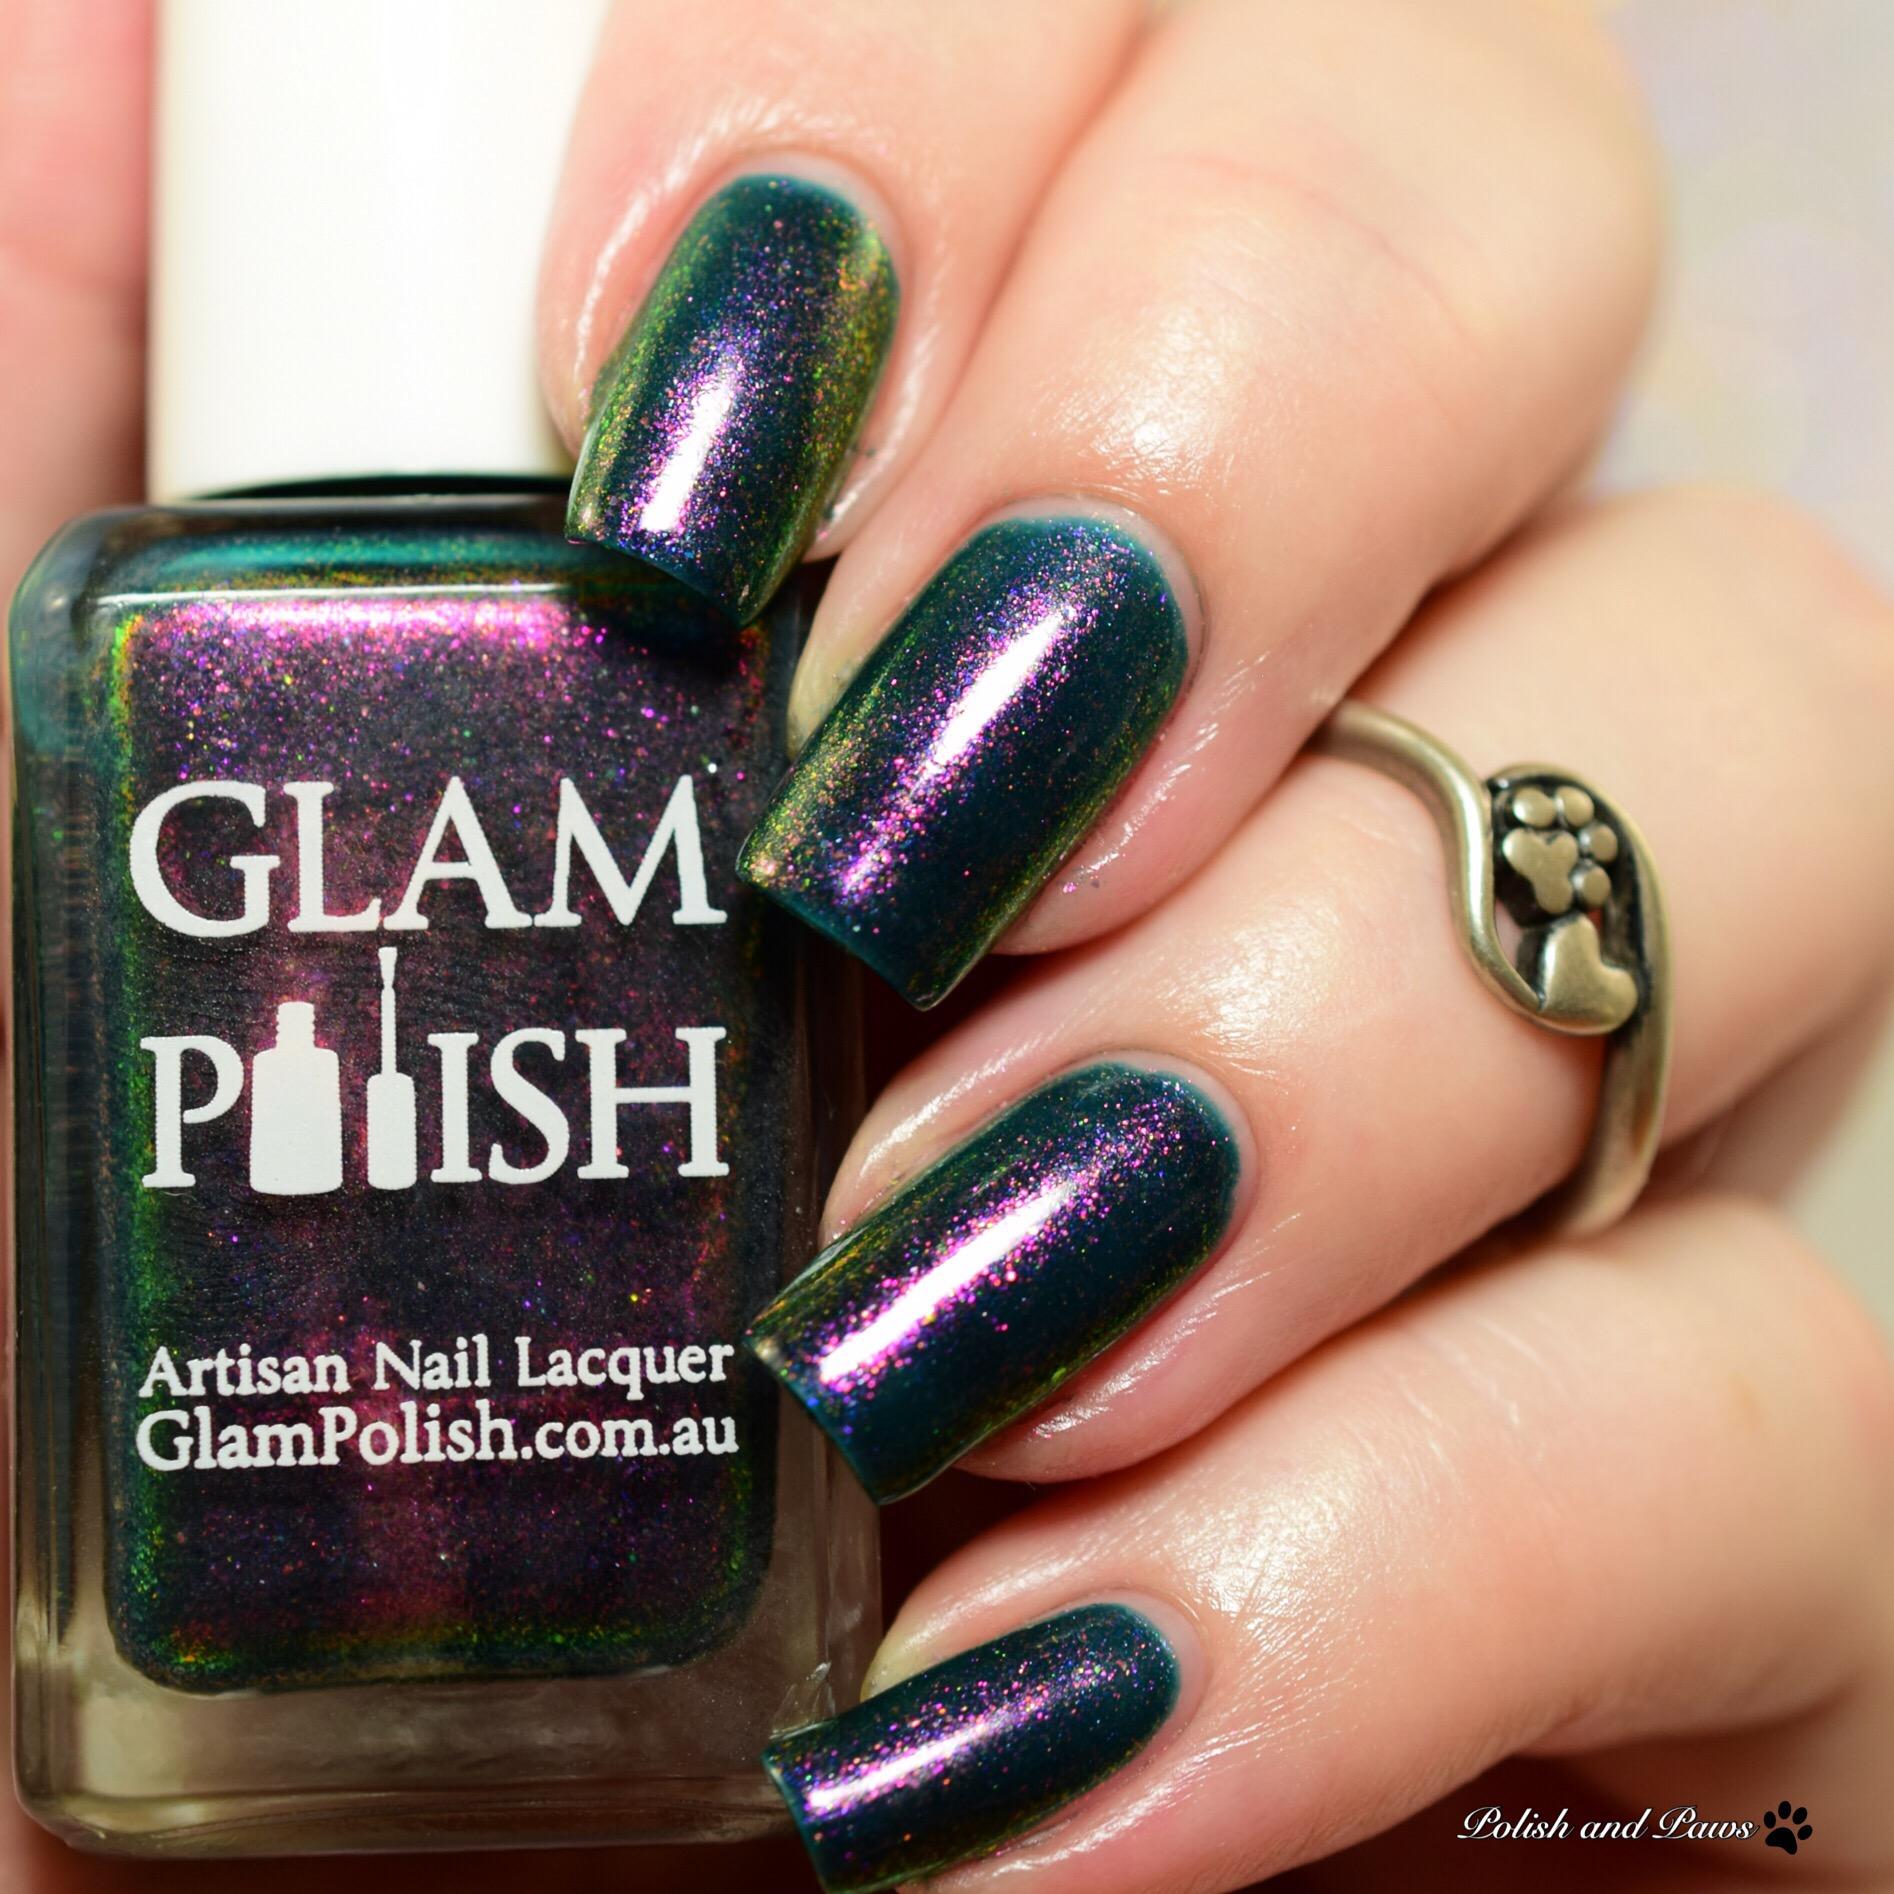 Glam Polish Expecto Patronum!